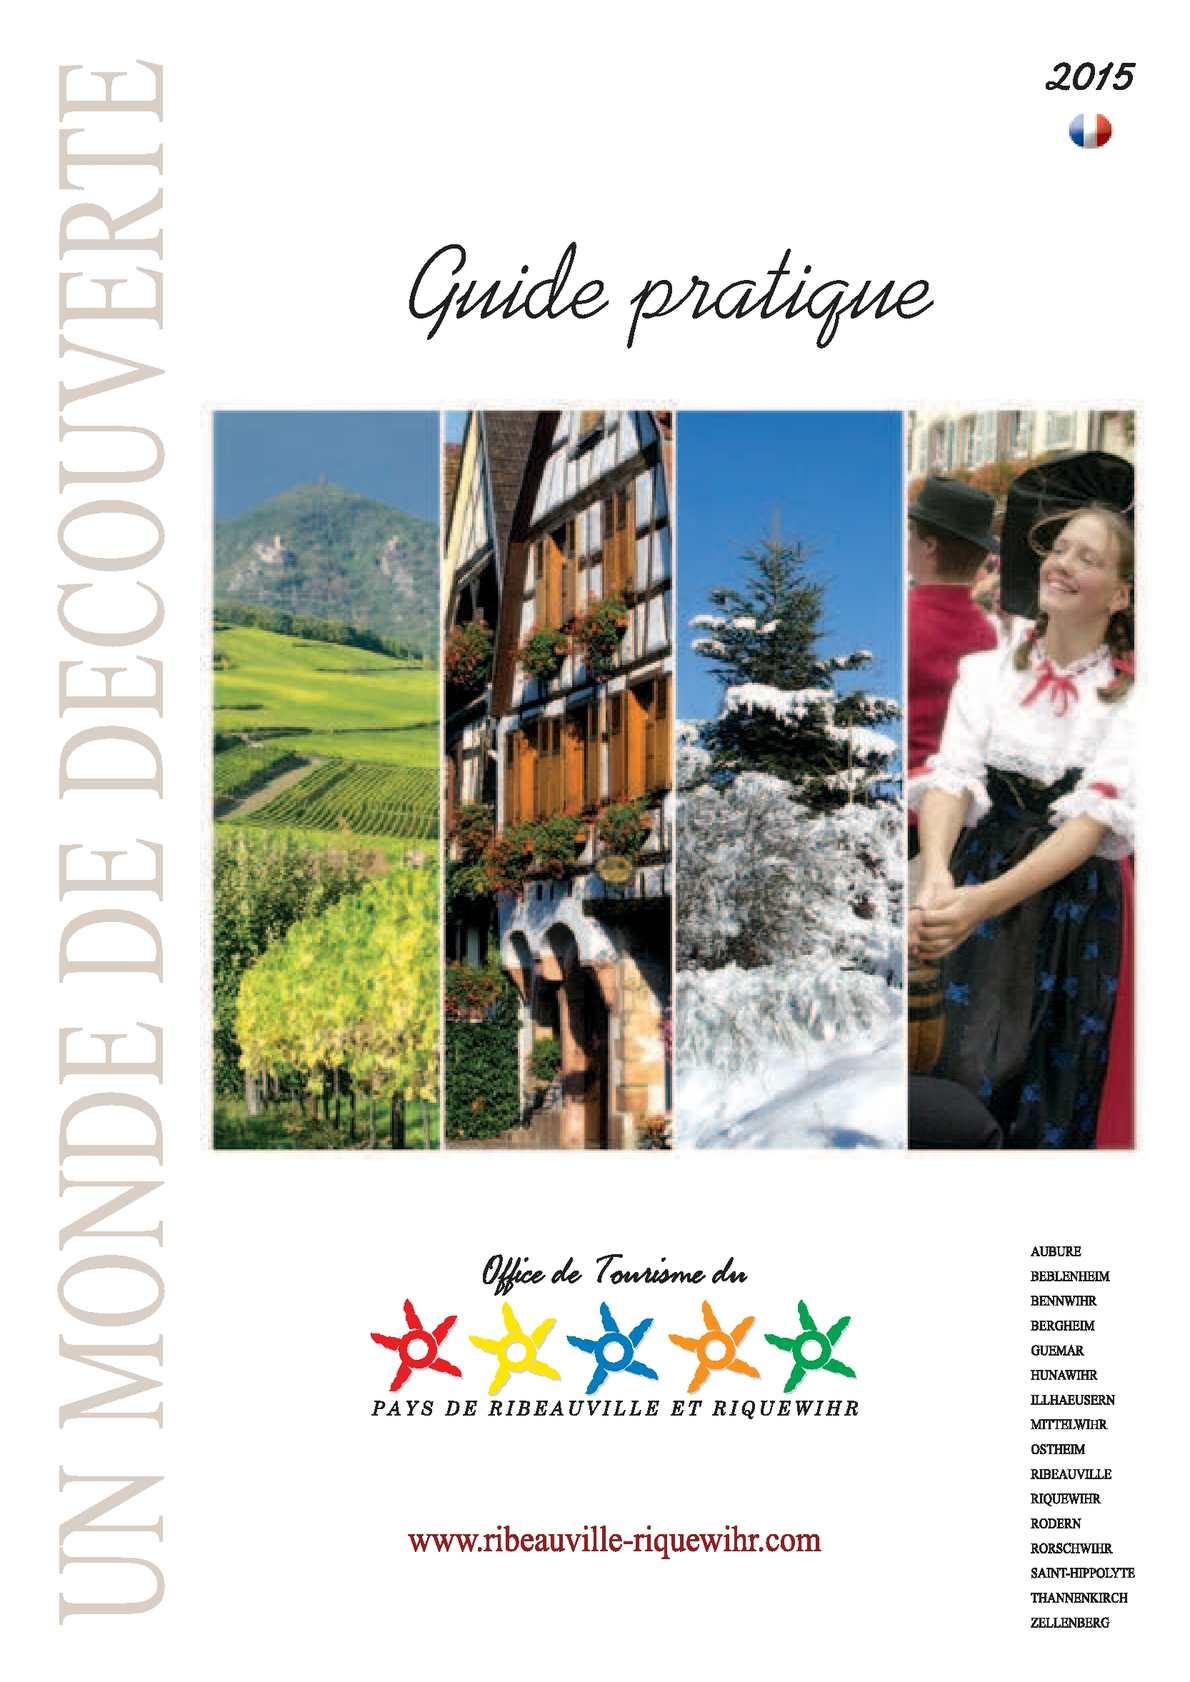 Calam o guide pratique 2015 pays de ribeauvill et riquewihr - Office du tourisme freiburg im breisgau ...